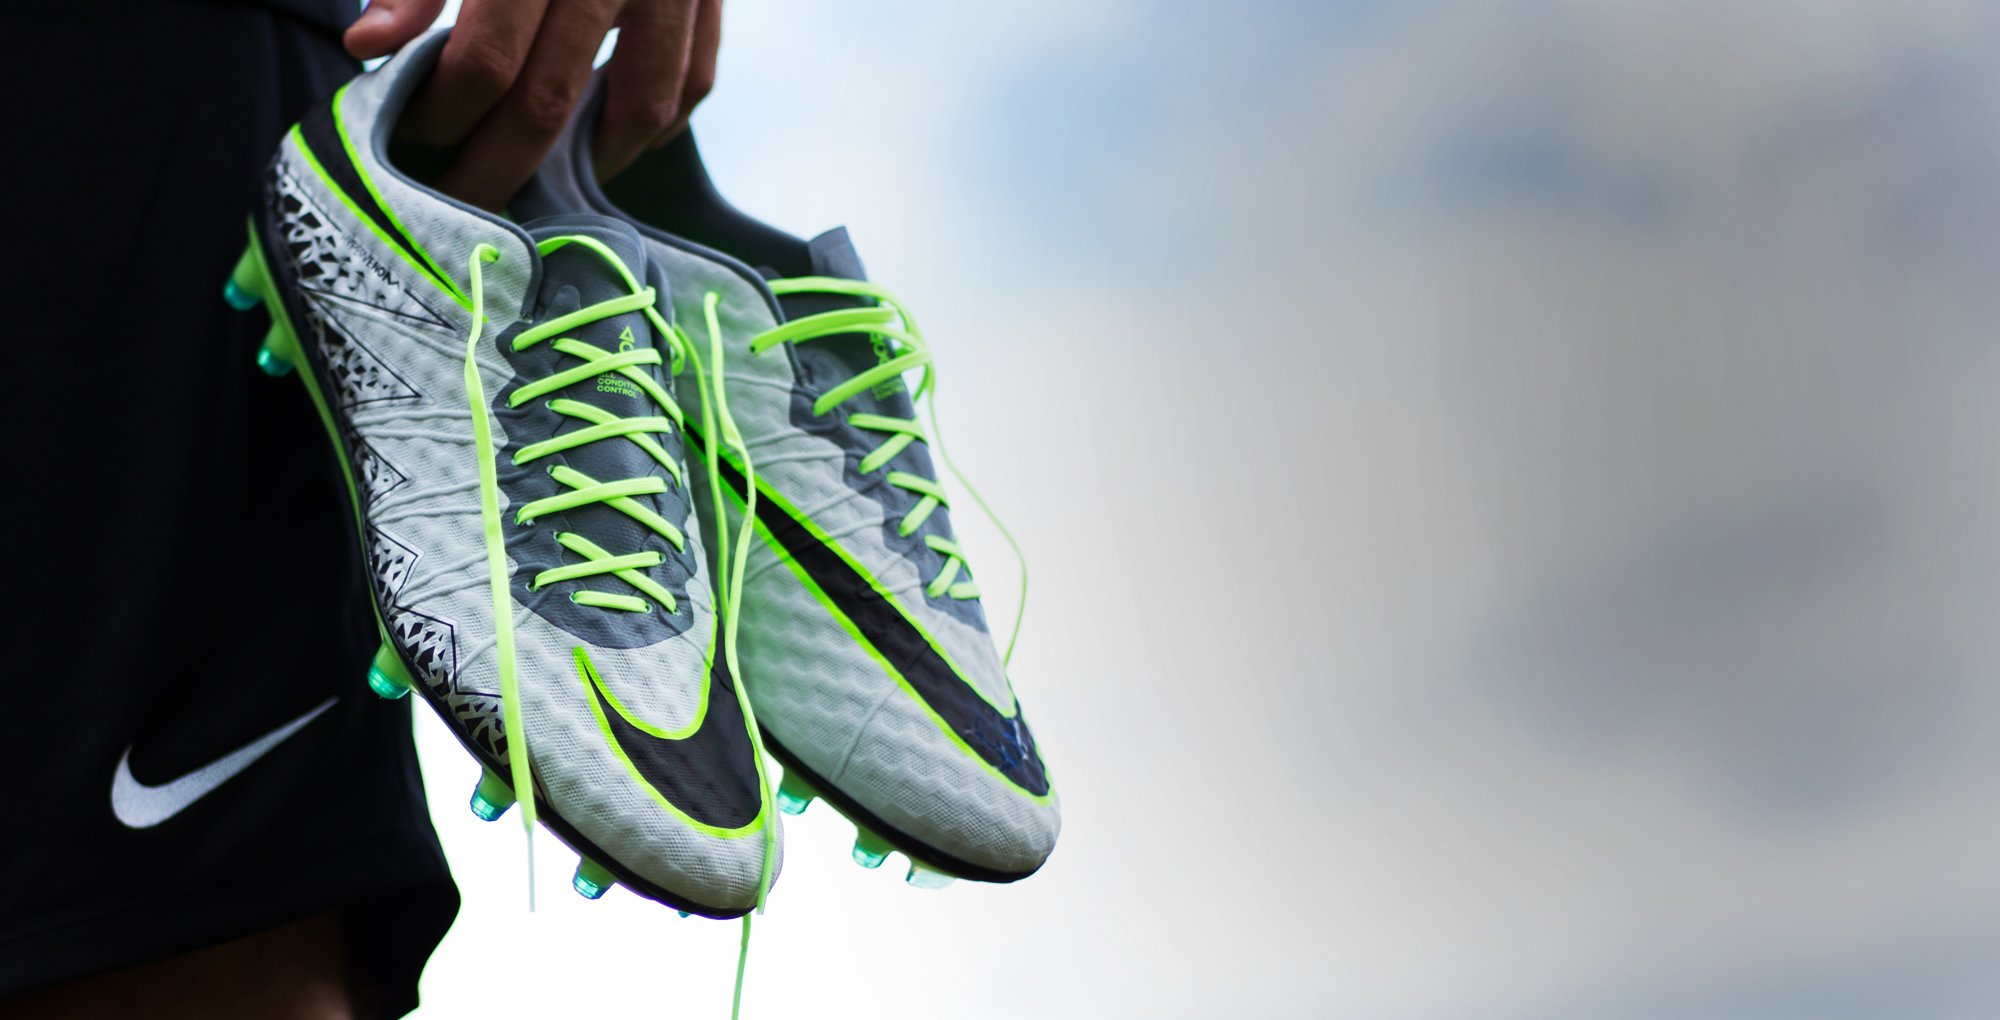 acceso Aprendiz enseñar  Nike Hypervenom Elite Pack